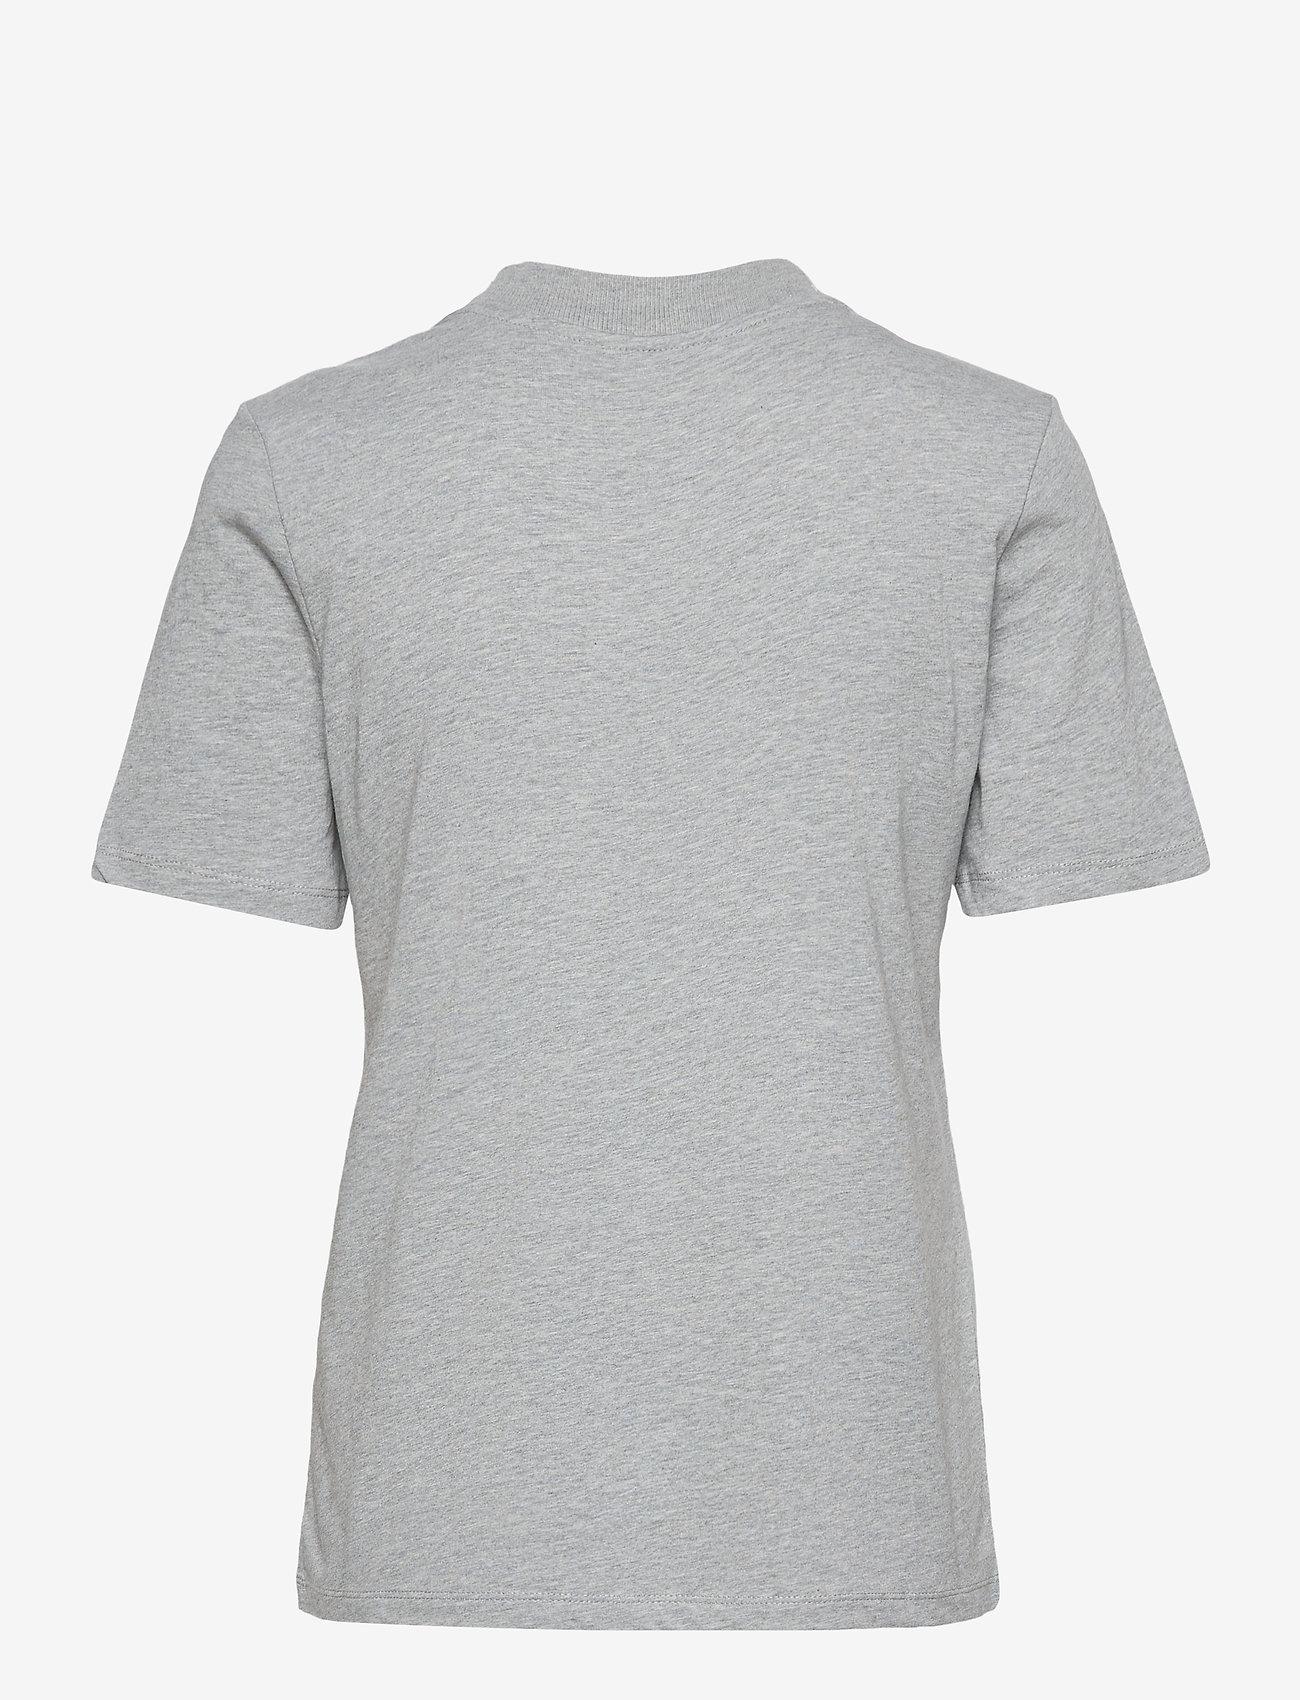 Tommy Hilfiger - REGULAR C-NK FLOCK TEE SS - t-shirts - light grey heather - 1